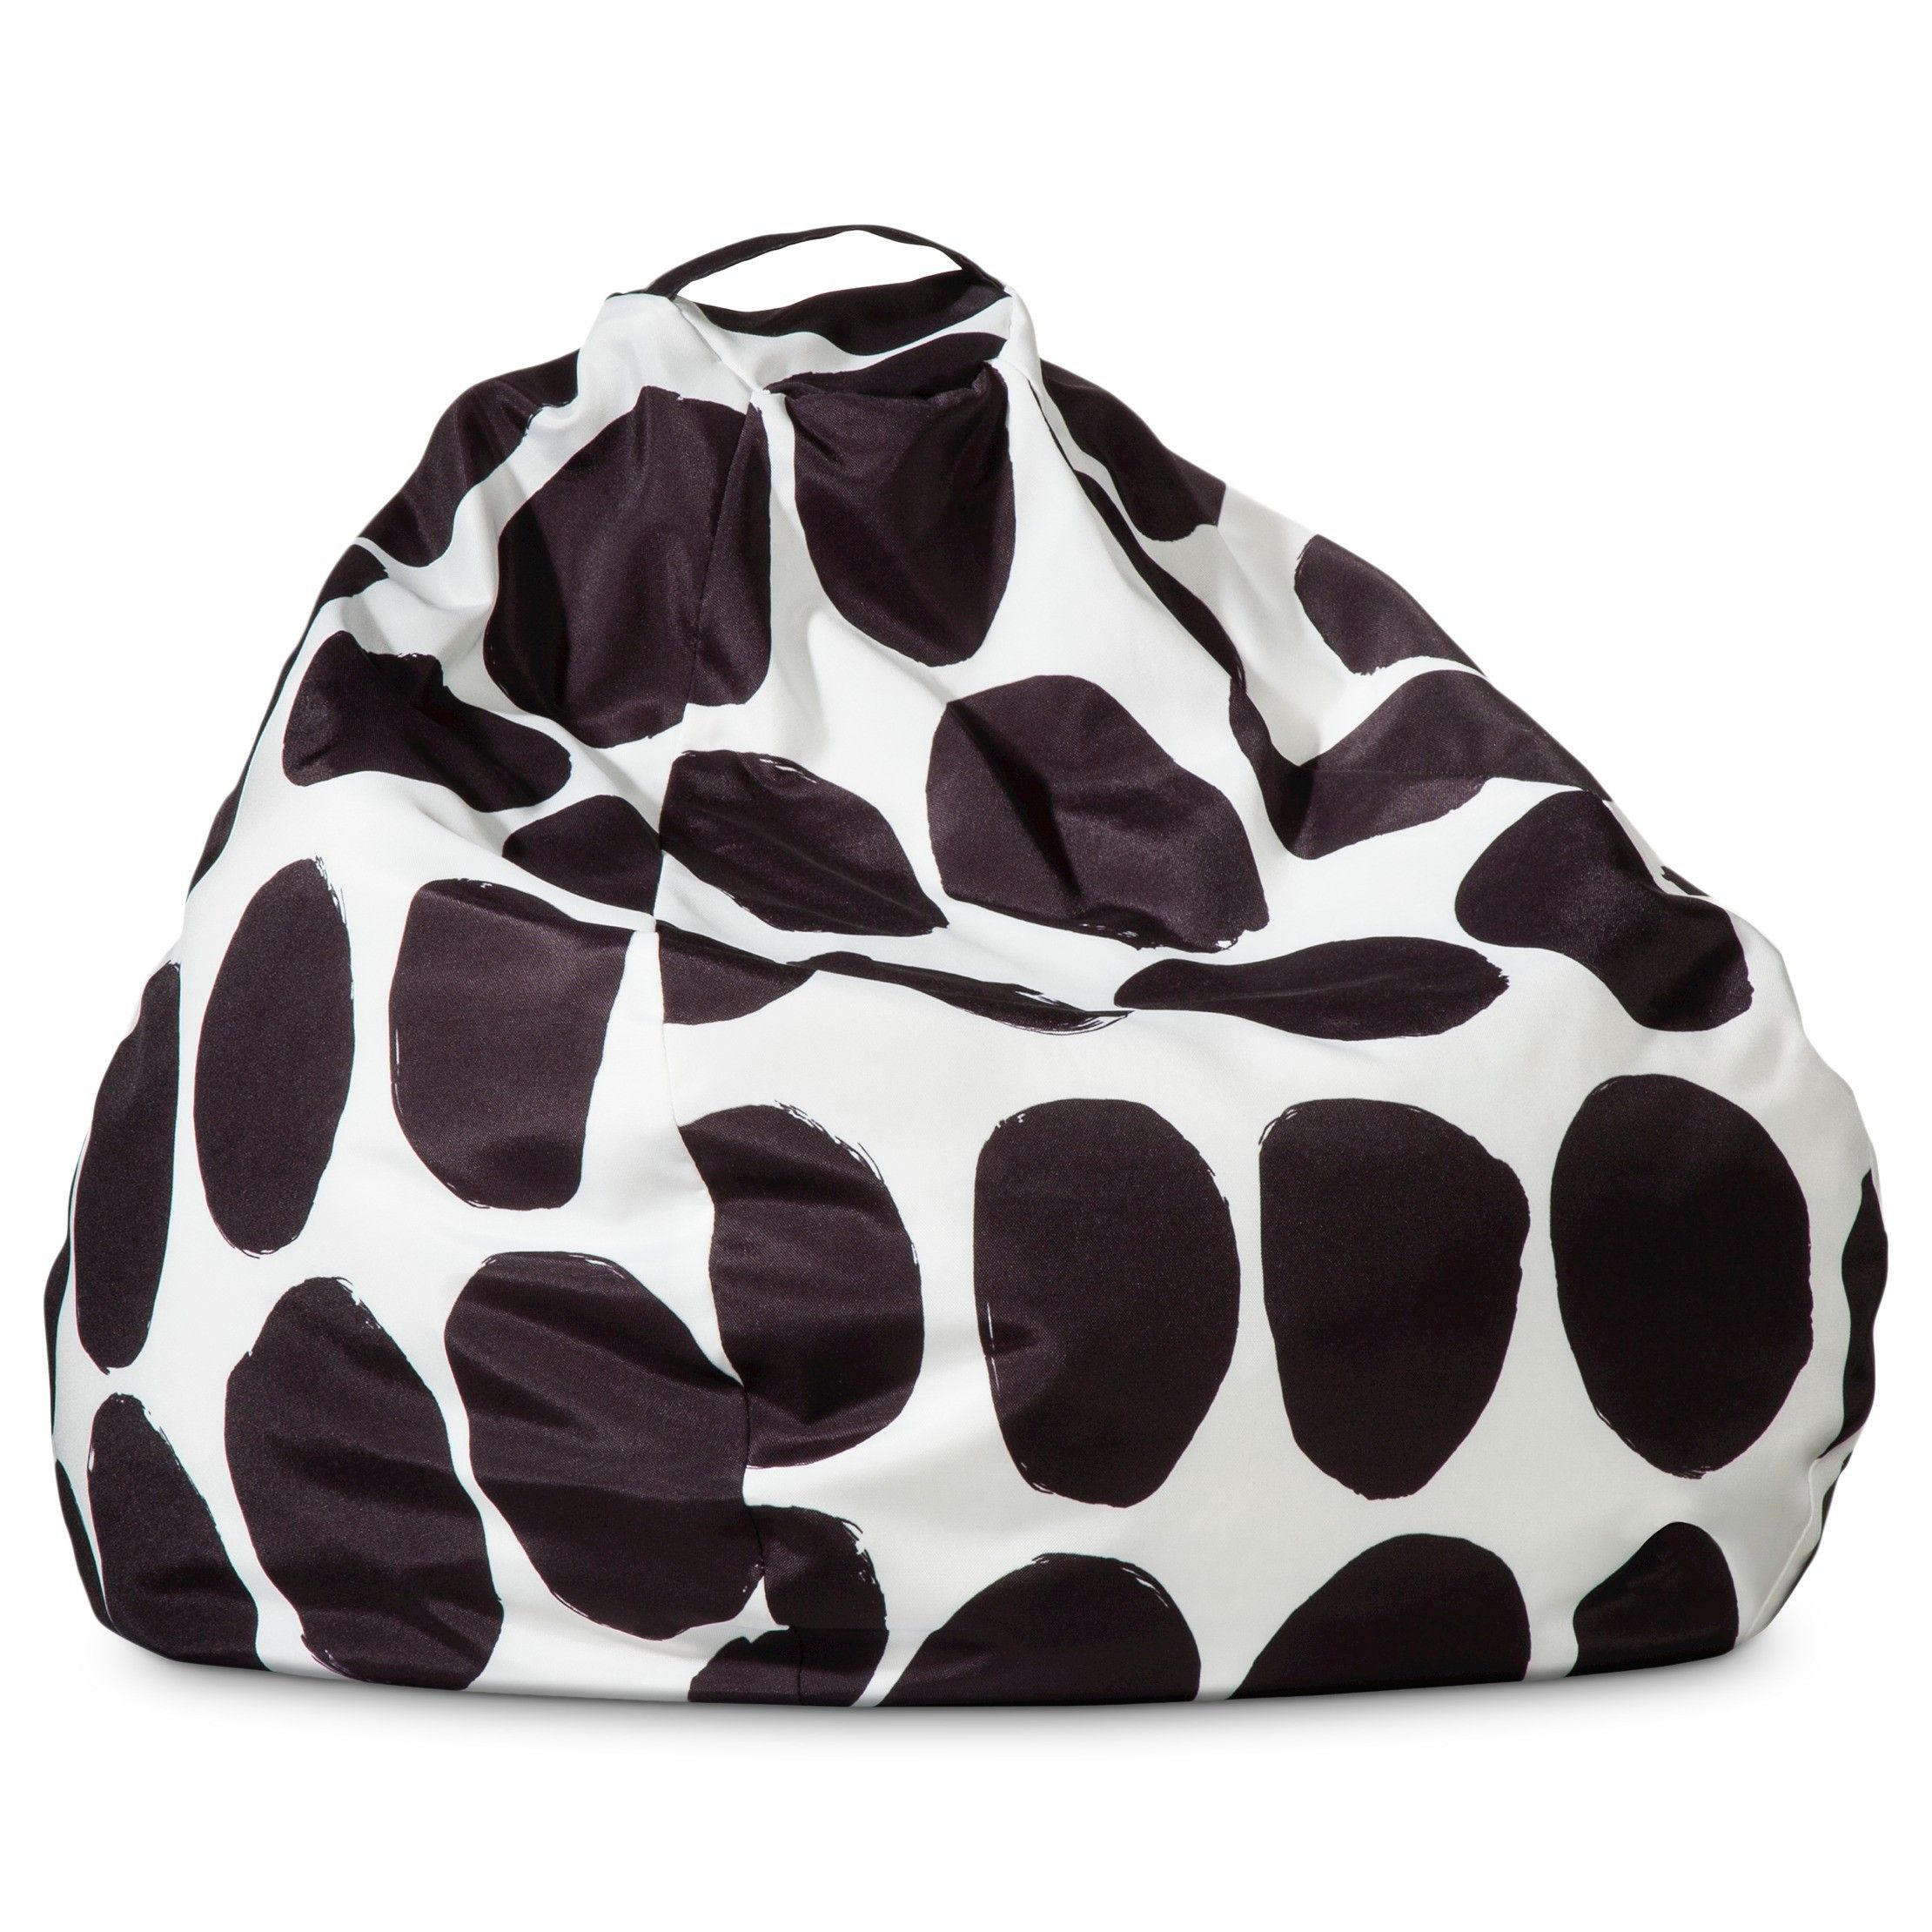 Pleasant Marimekko For Target Bean Bag In 2019 Bean Bag Chairs Pabps2019 Chair Design Images Pabps2019Com